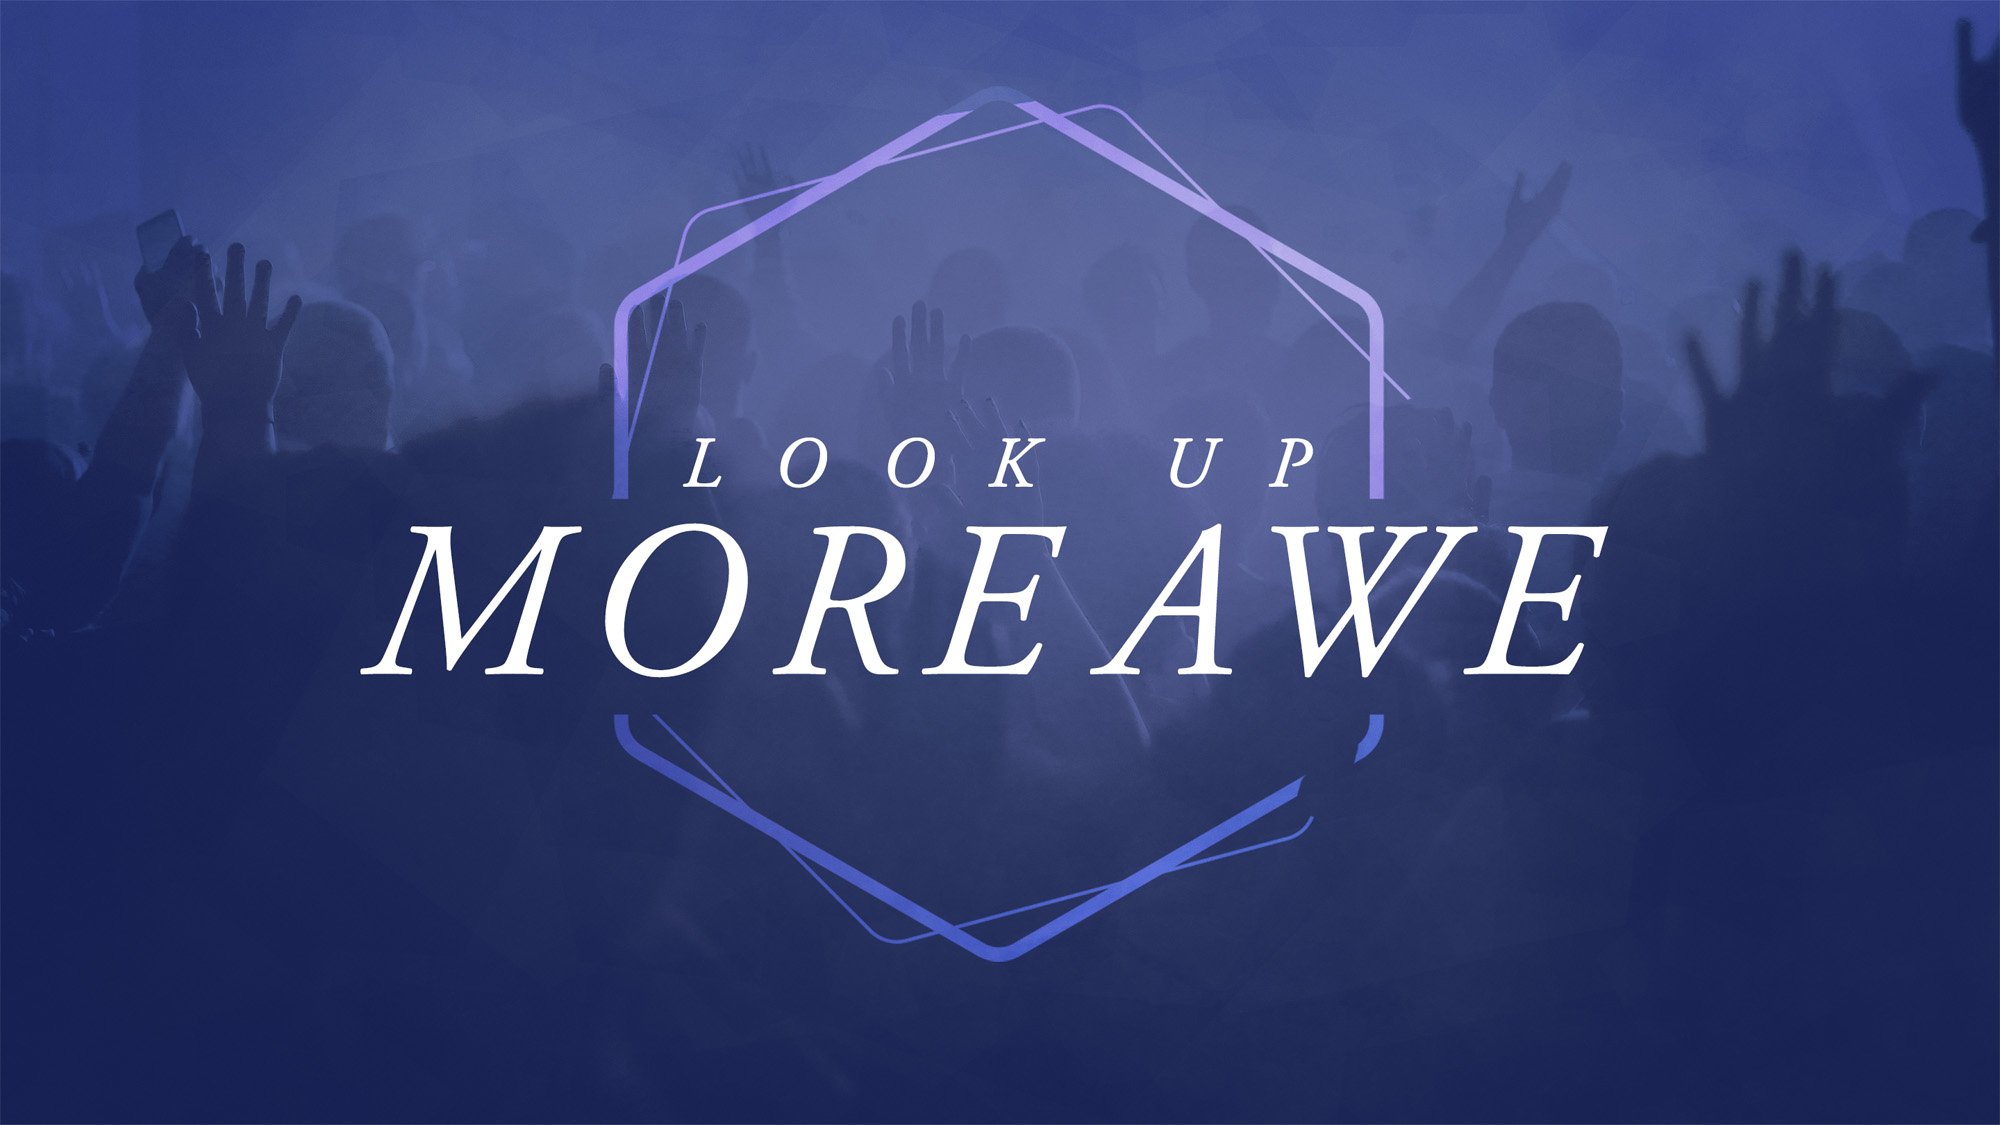 Look Up - More Awe